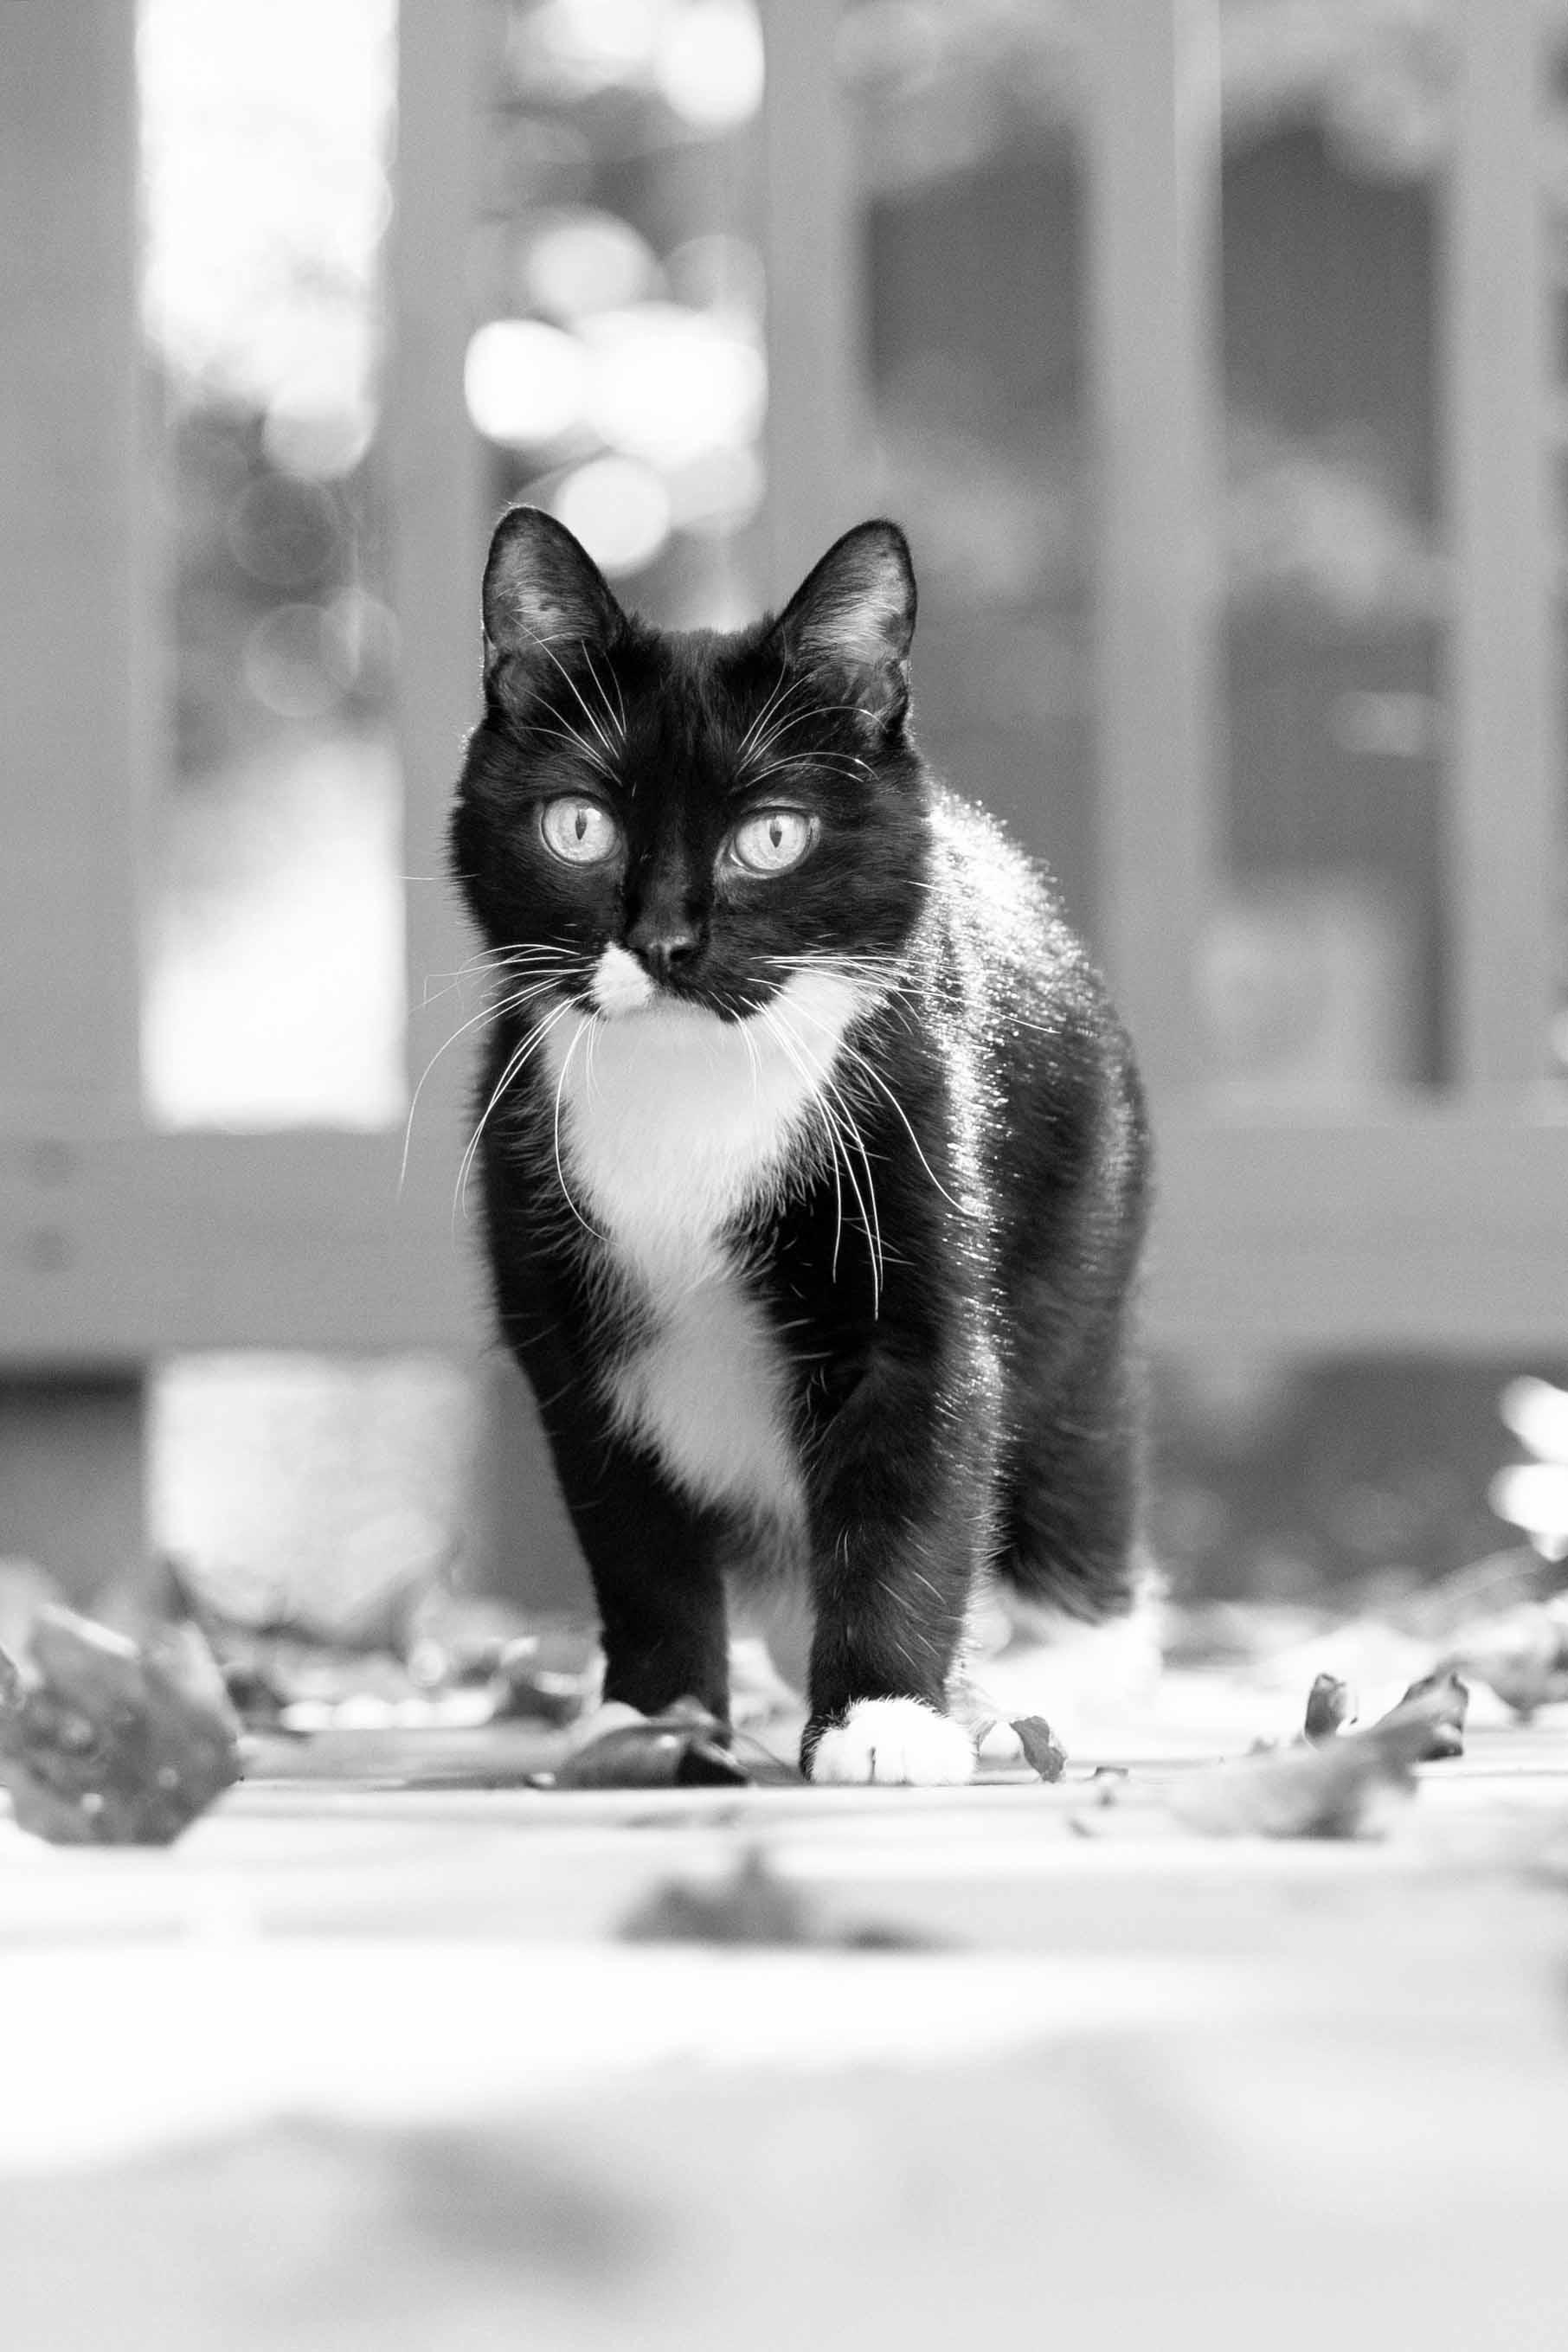 Arlington_Cat_Photographer_10282017_05.jpg